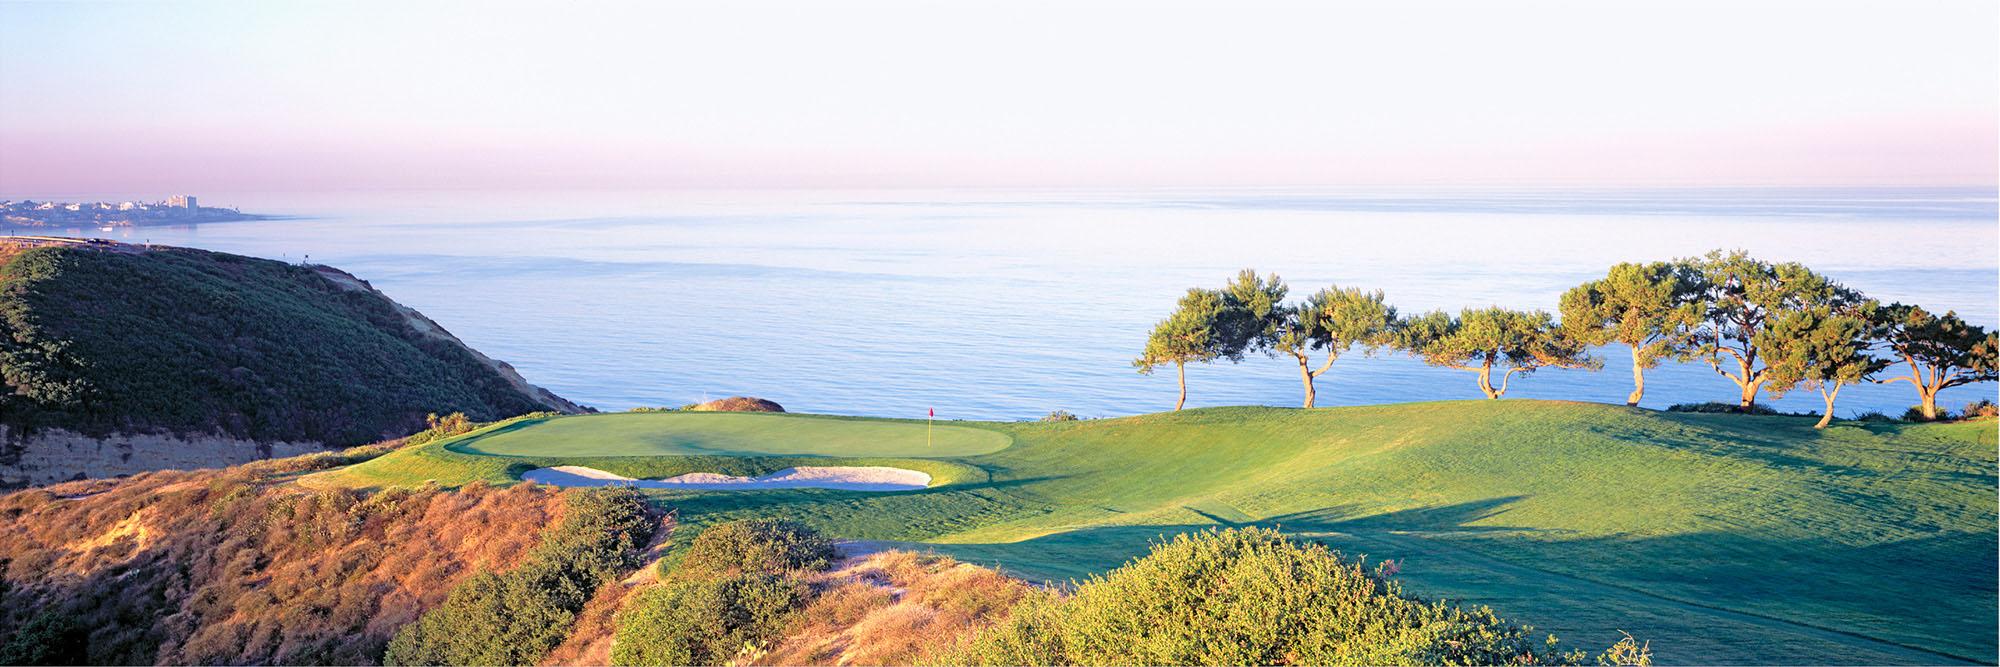 Golf Course Image - Torrey Pines South No. 3